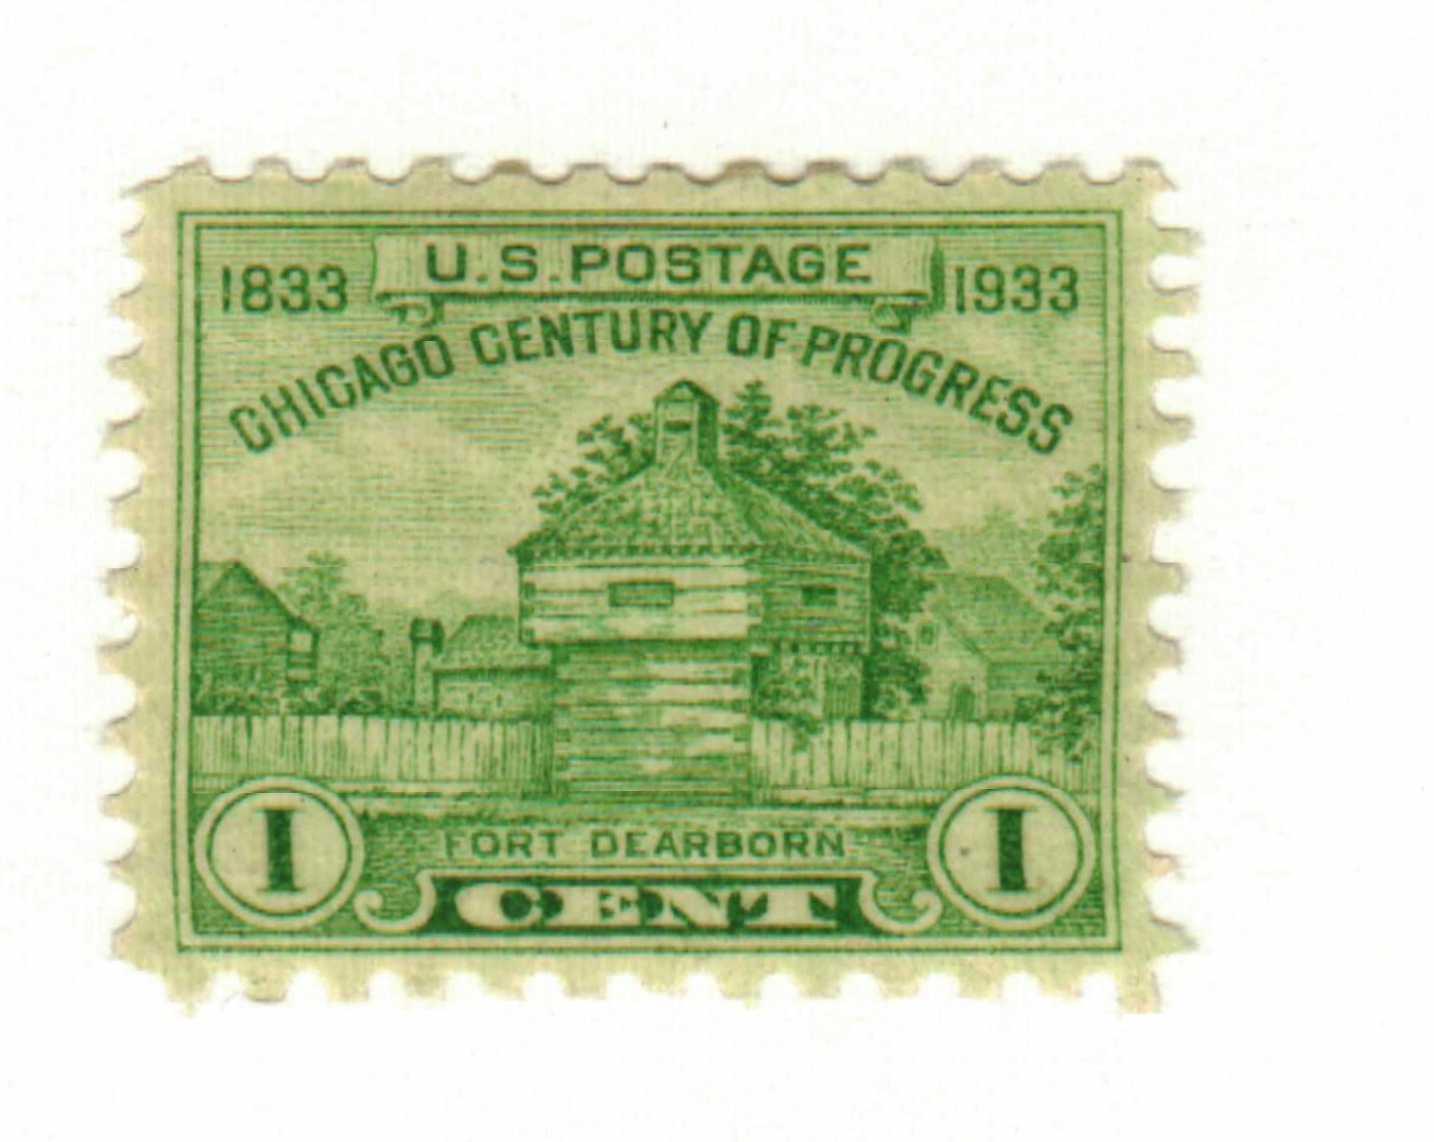 1933 1c Restoration of Fort Dearborn